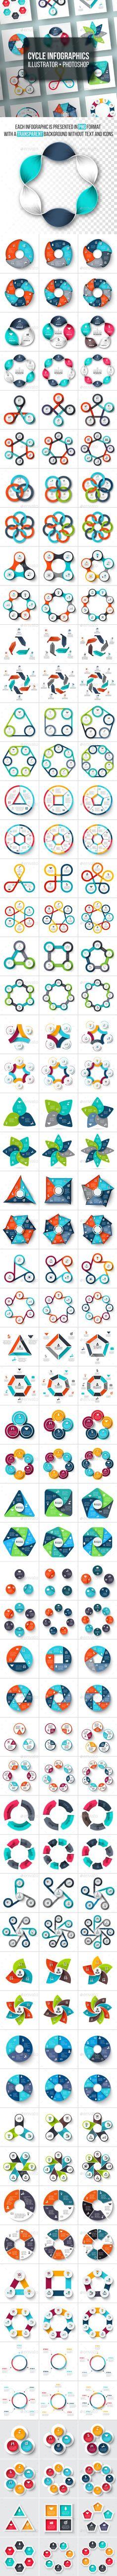 15 Best Color Palette Images Infographic Palette Brand